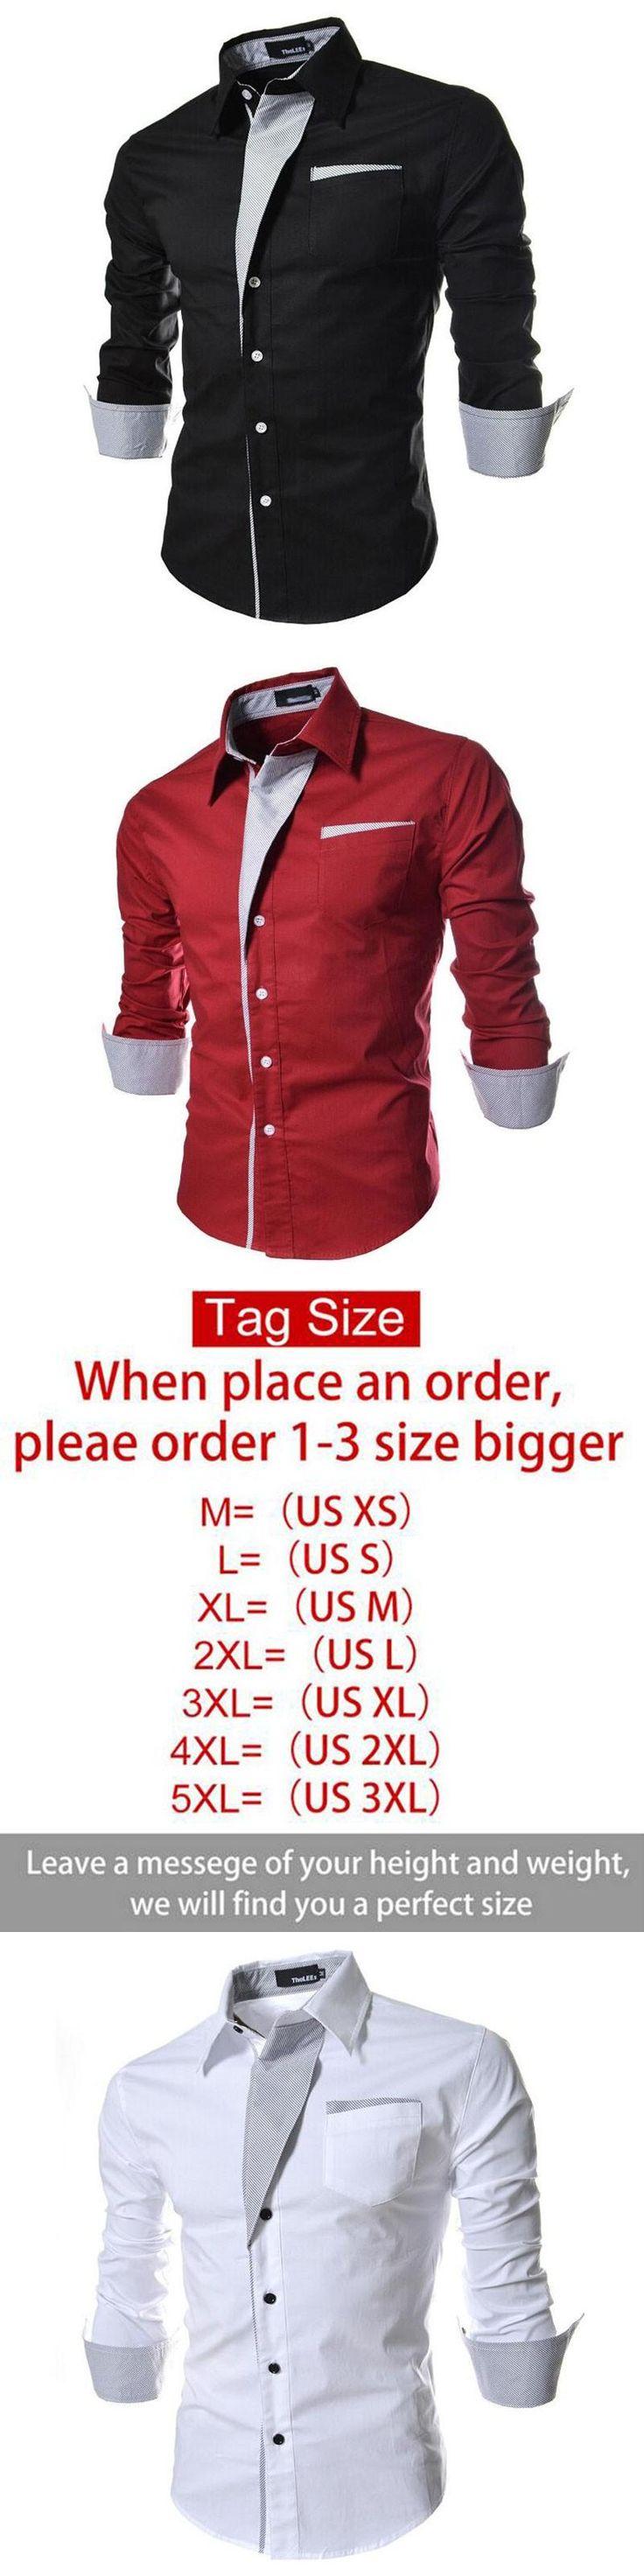 striped shirt men long sleeve 2016 brand new casual shirt chemise for men slim fit tuxedo shirt camisa masculina size 3xl